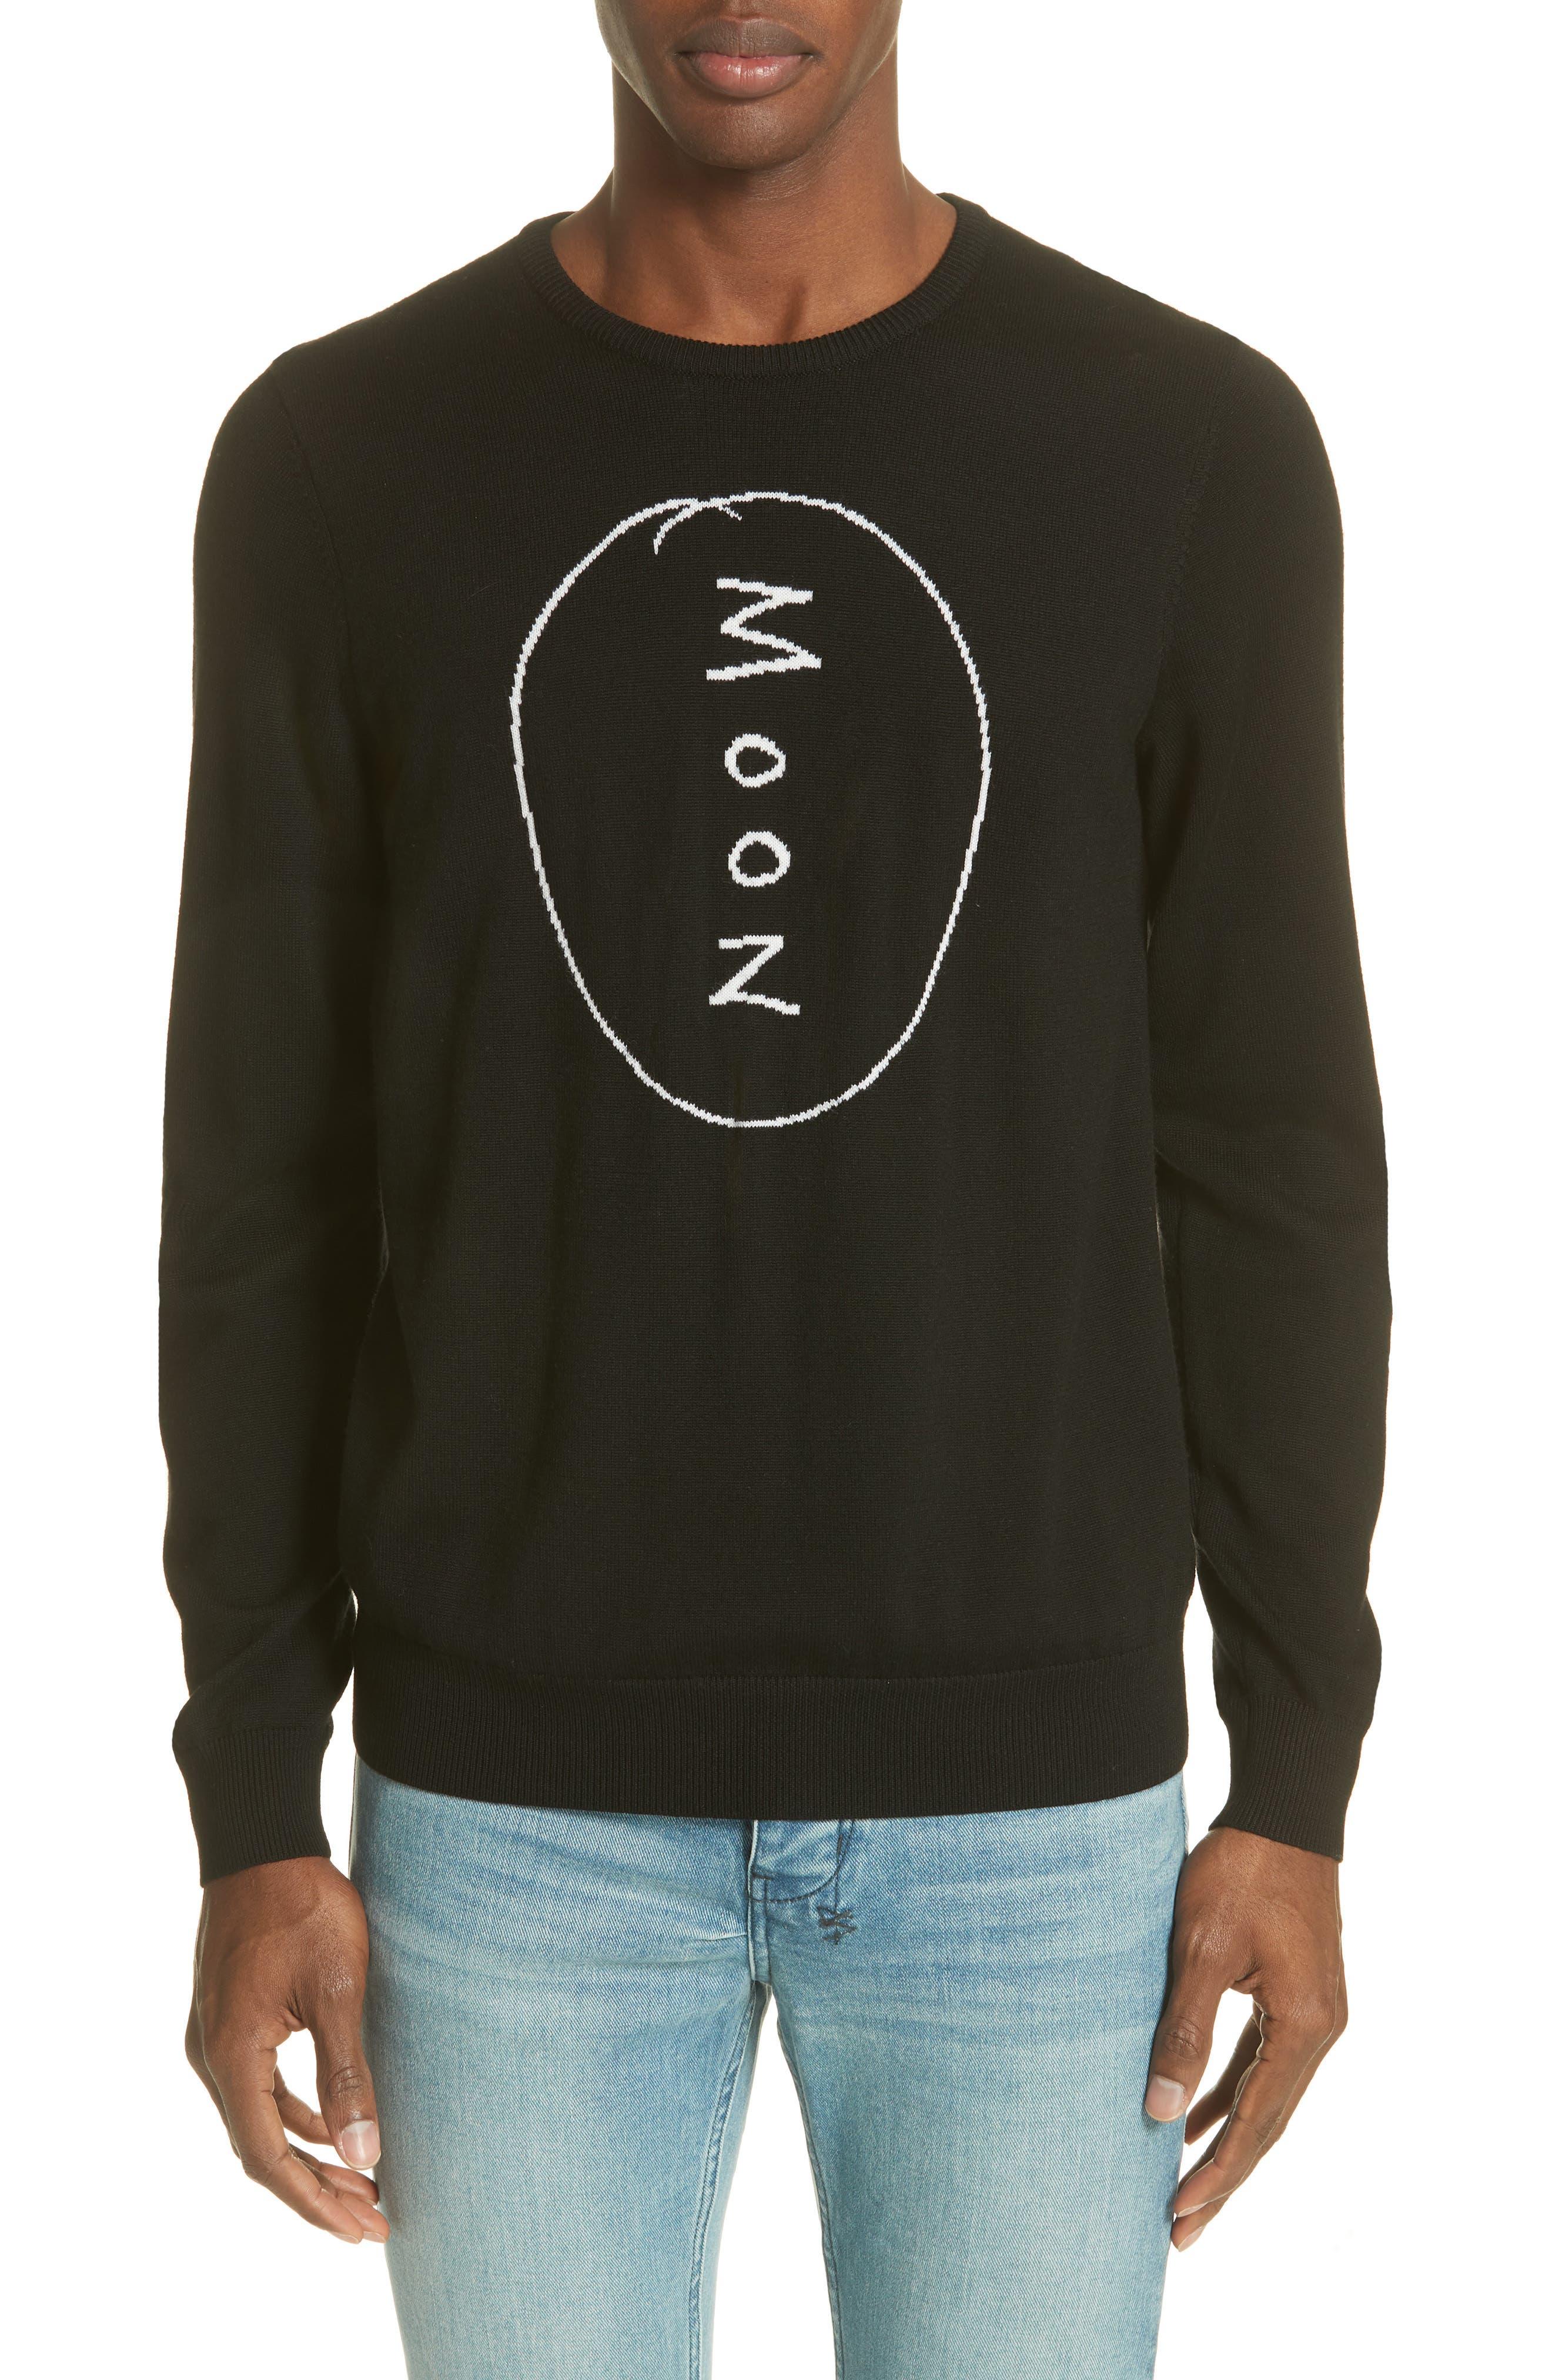 Moon Merino Wool Sweater,                             Main thumbnail 1, color,                             001